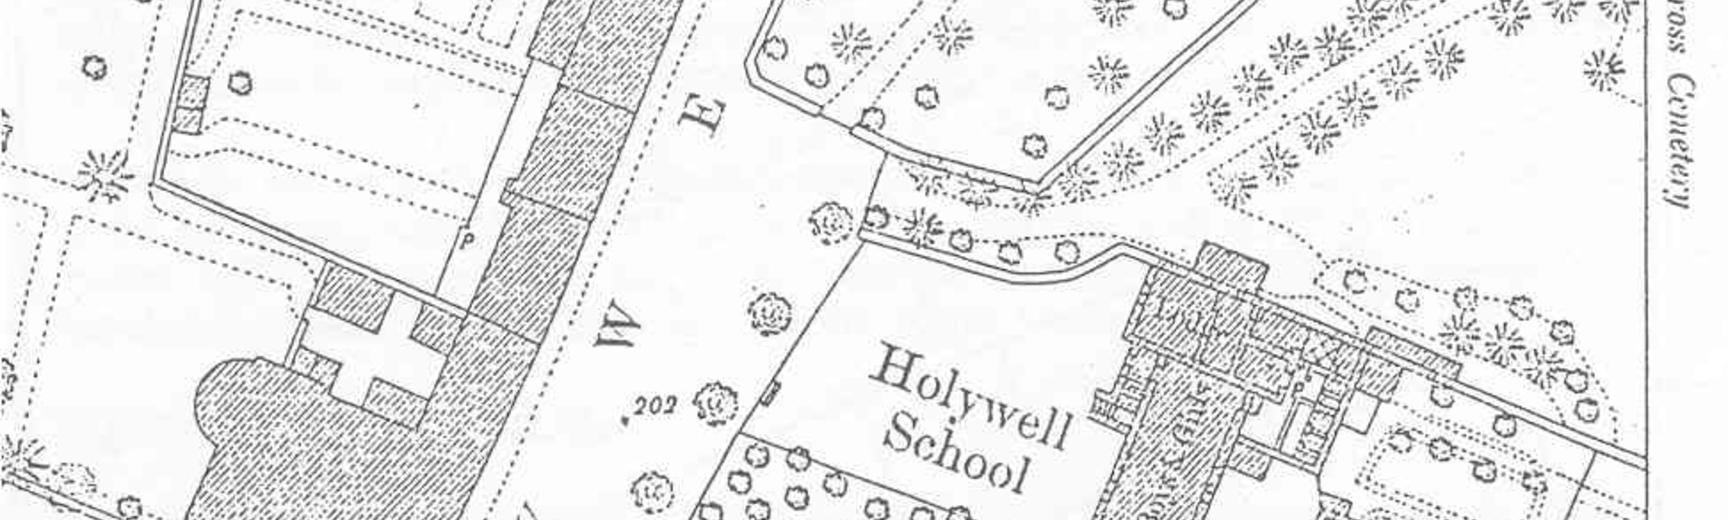 1874 Survey of St Cross Road